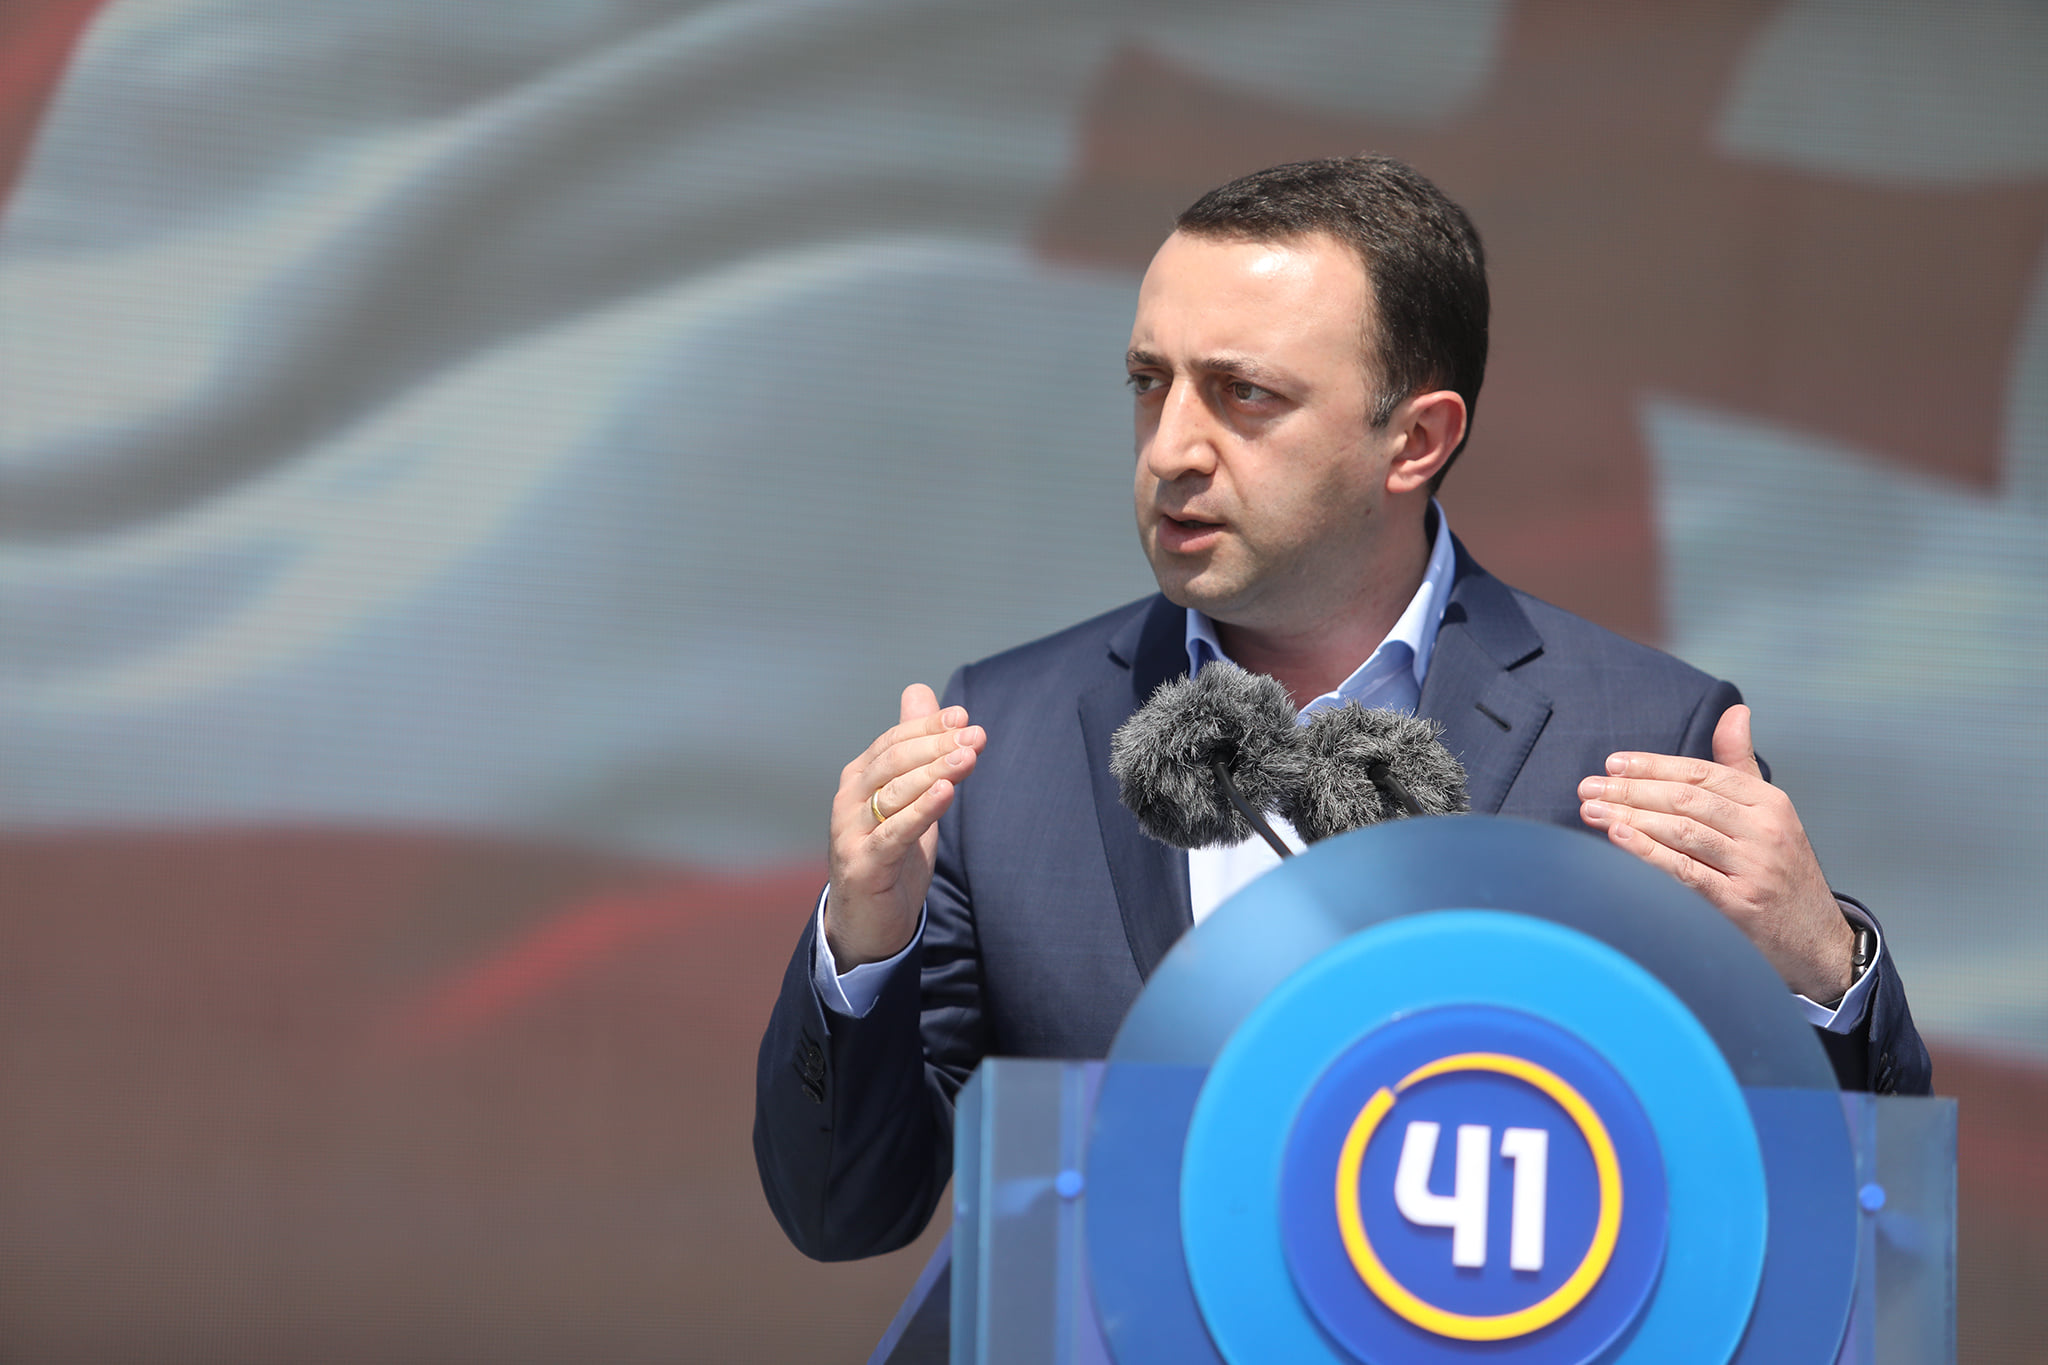 Irakli Gharibashvili 321422 #новости Ираклий Гарибашвили, Михаил Саакашвили